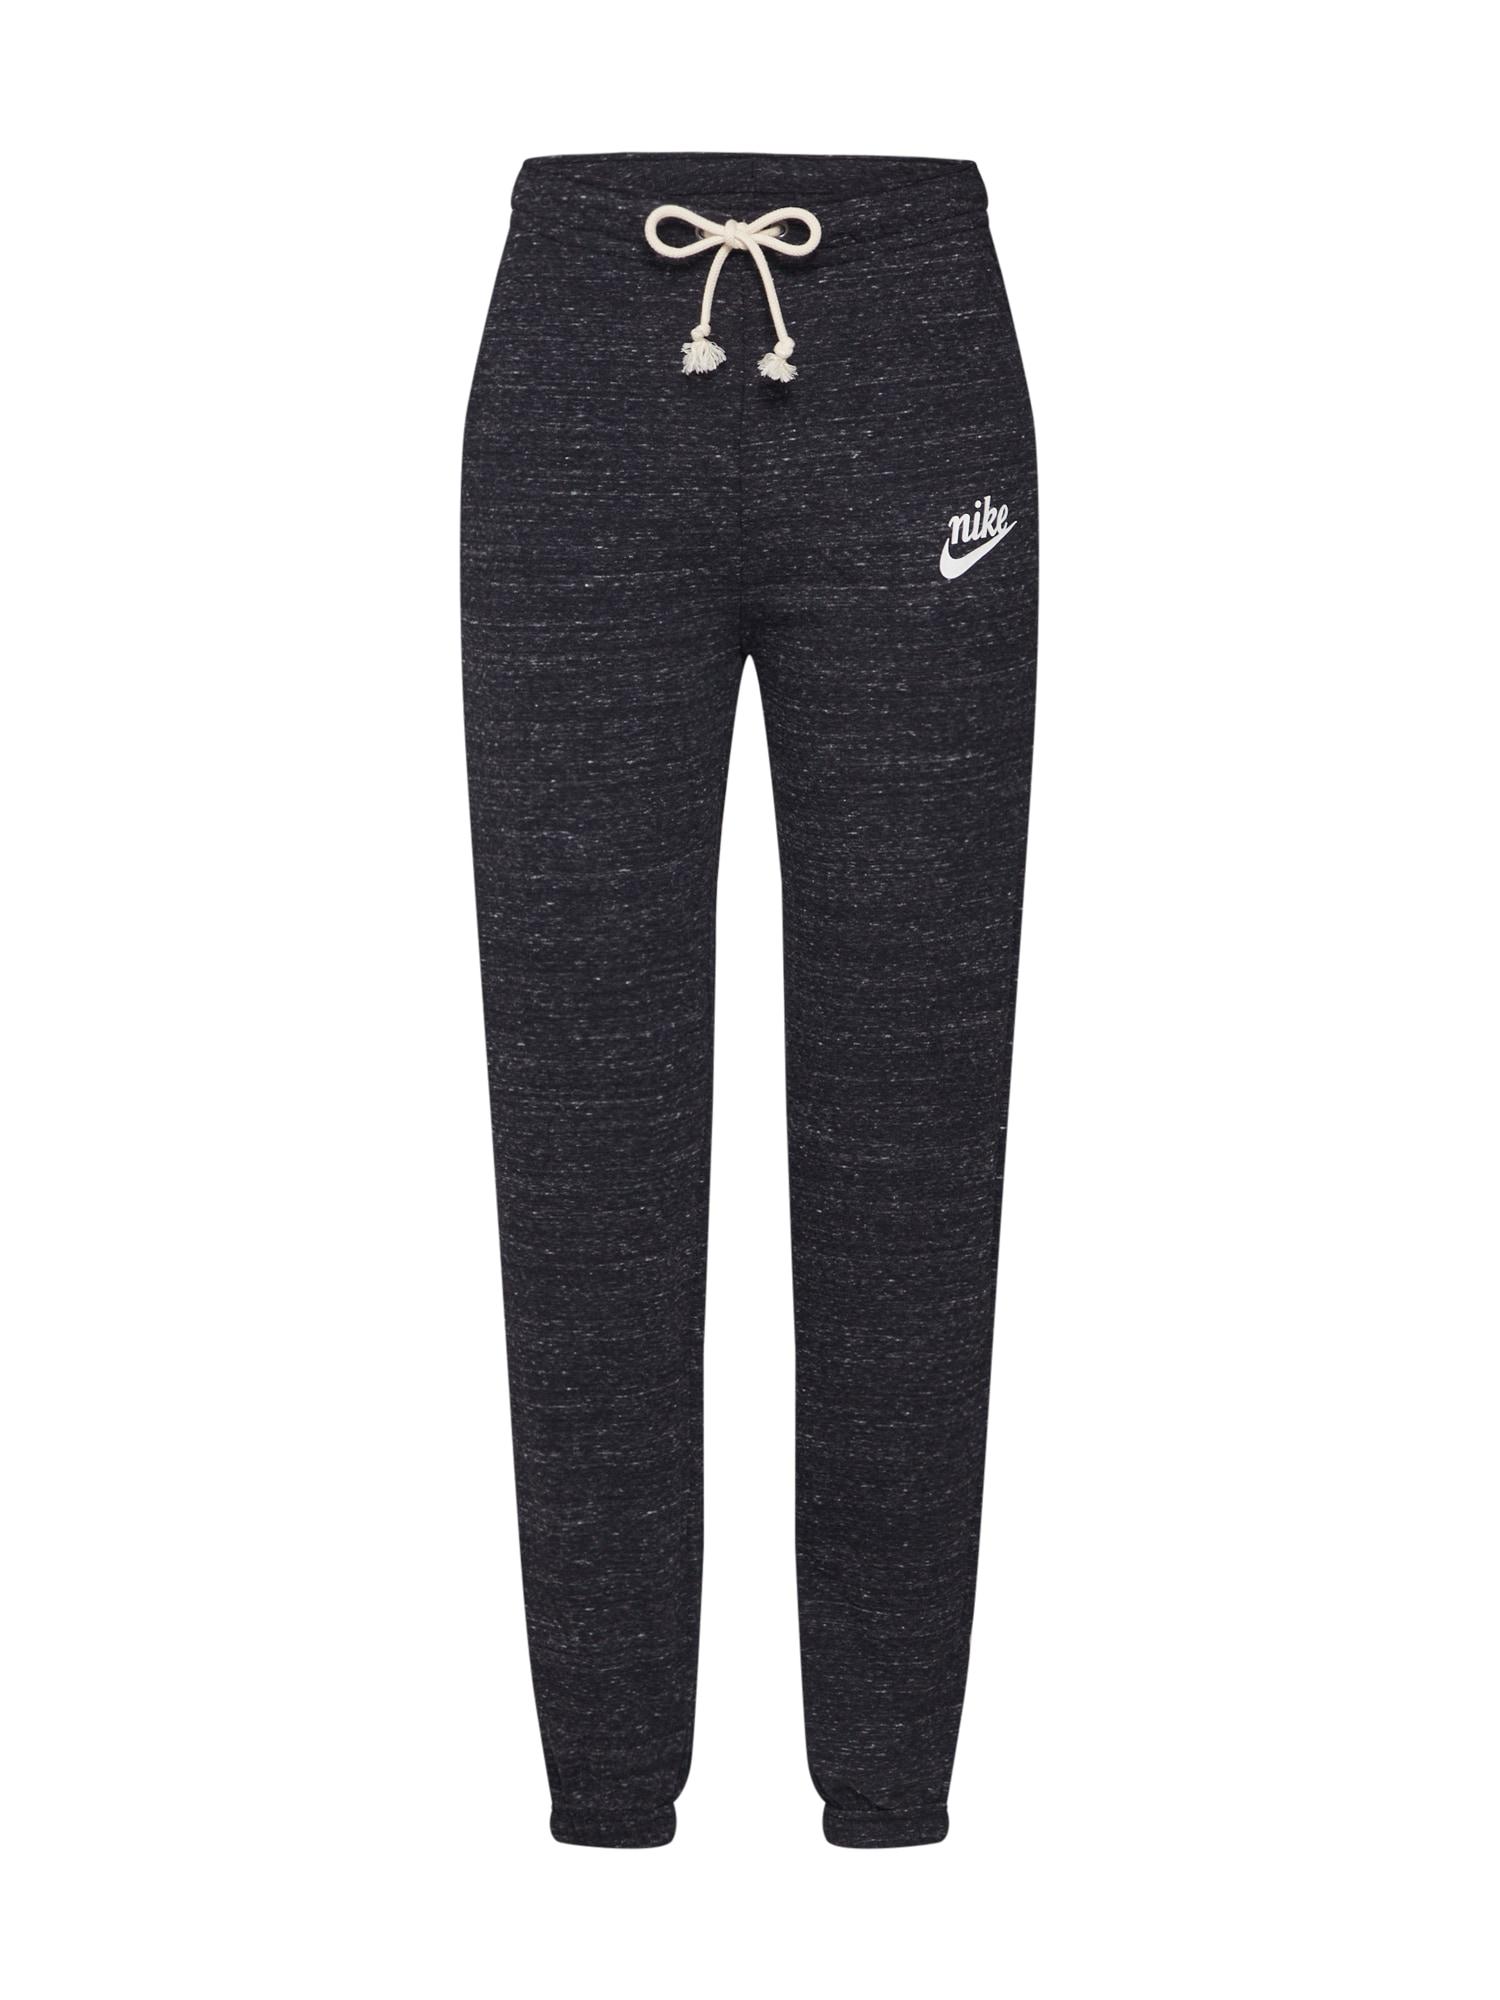 Nike Sportswear Kelnės 'W NSW GYM VNTG PANT' perlų balta / bazalto pilka